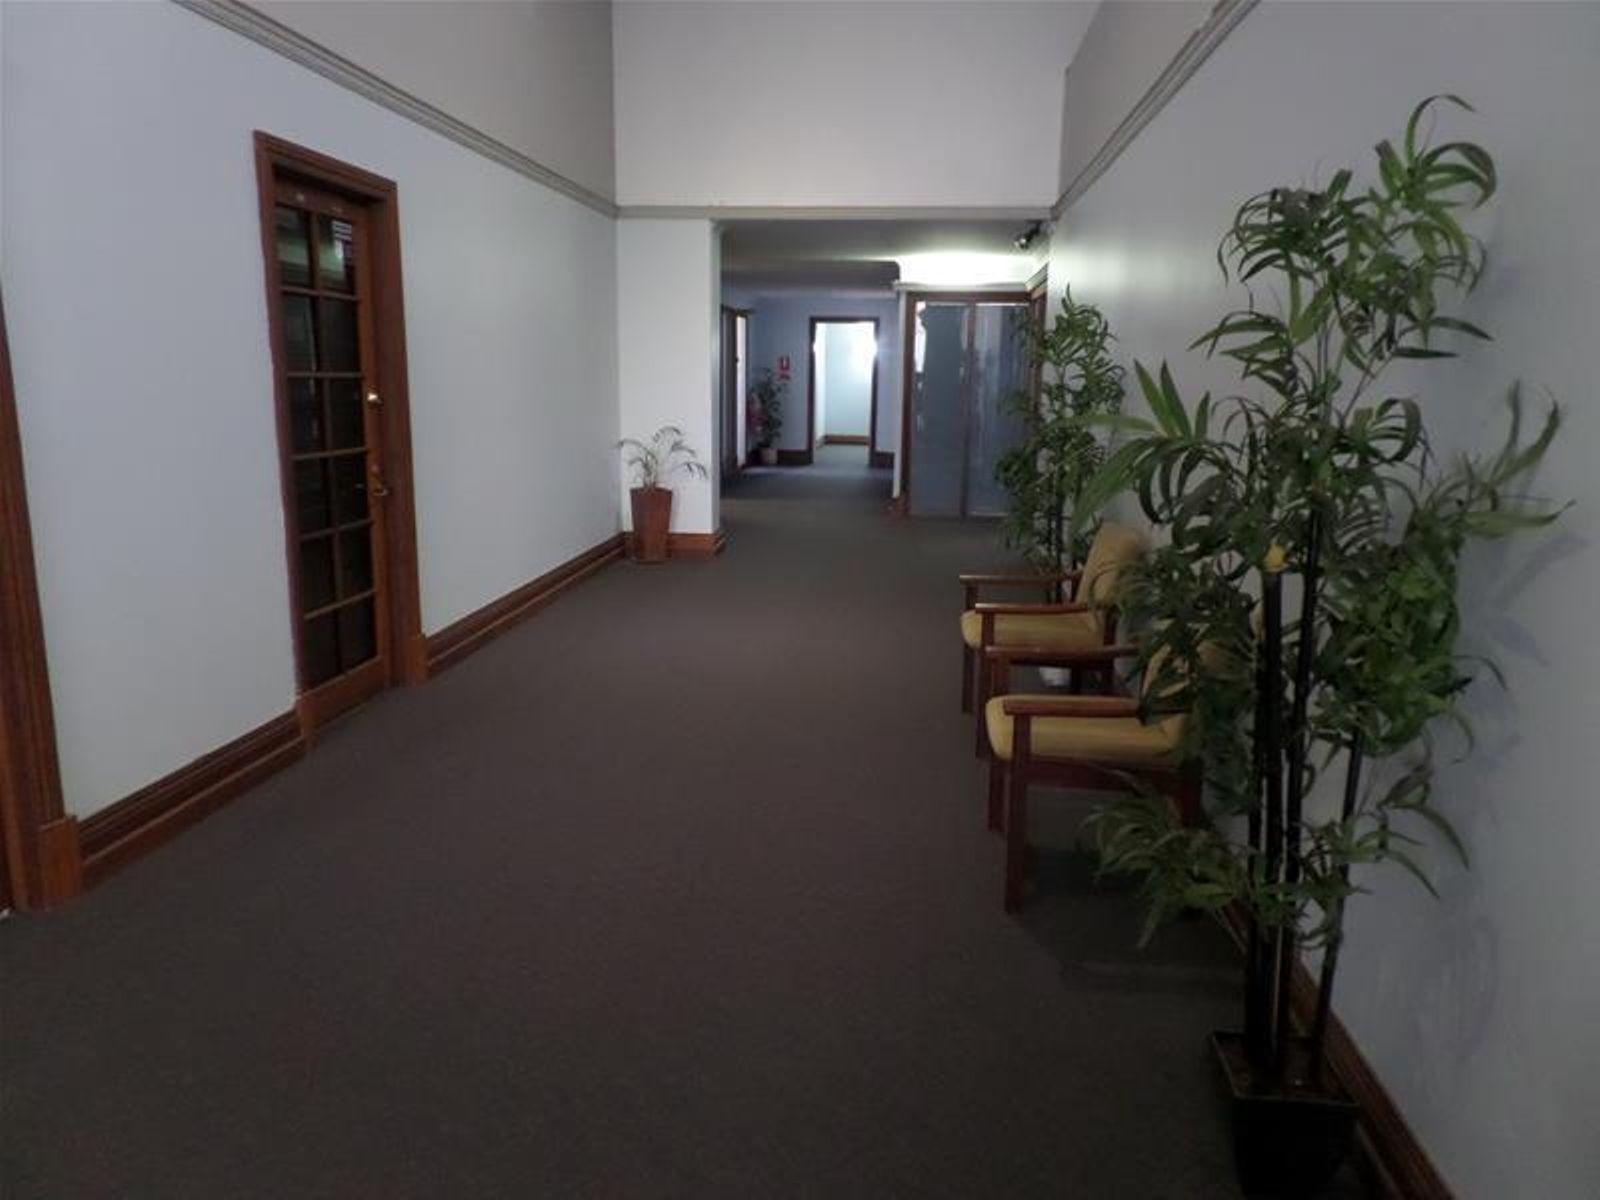 Suite F9/140 - 144 Hannan Street, Kalgoorlie, WA 6430